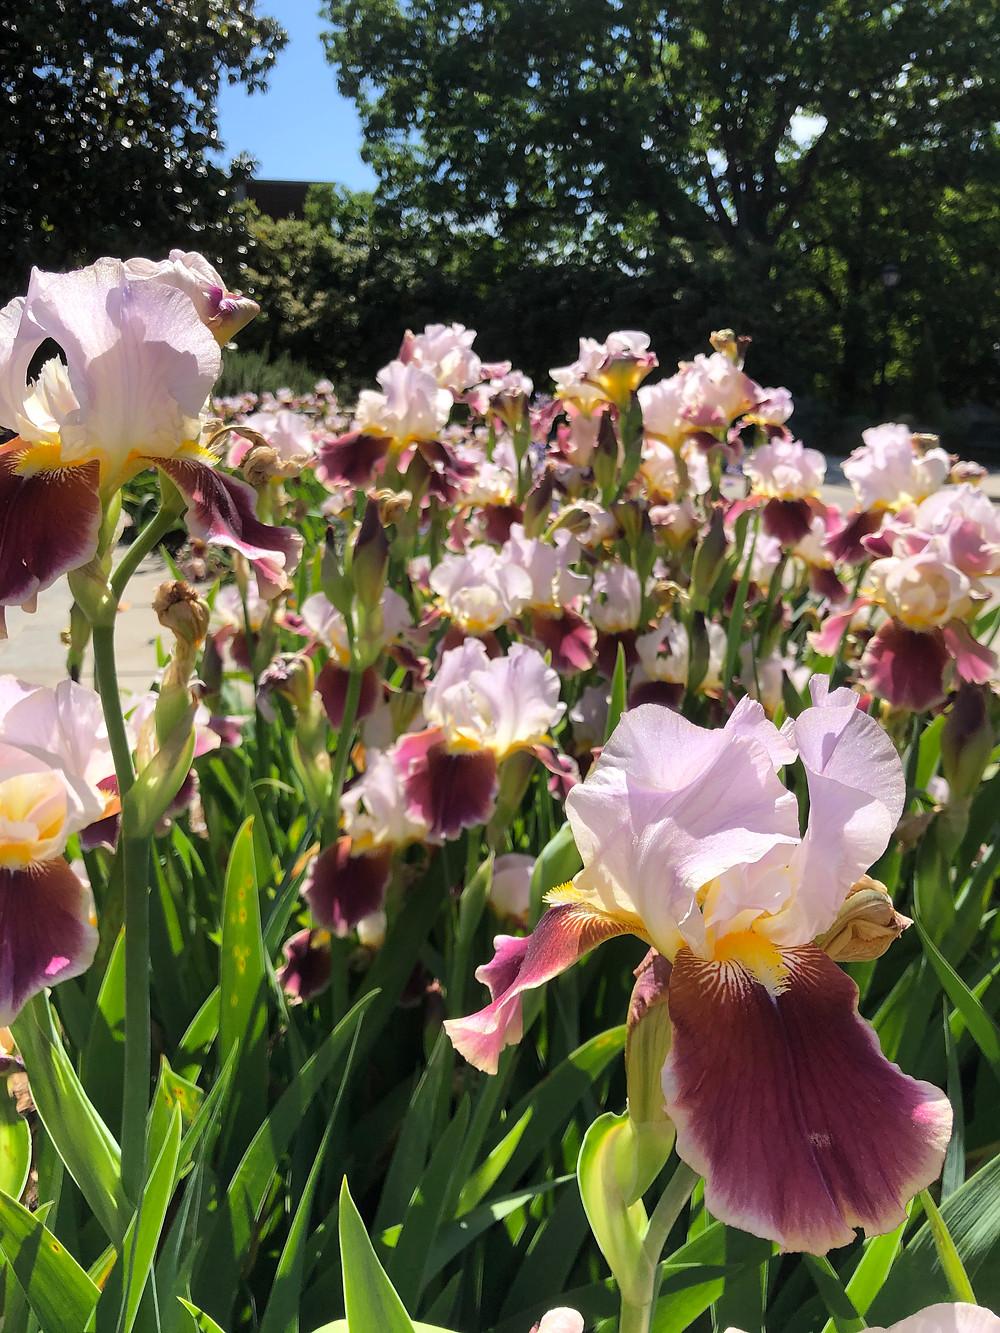 Maroon and pink irises